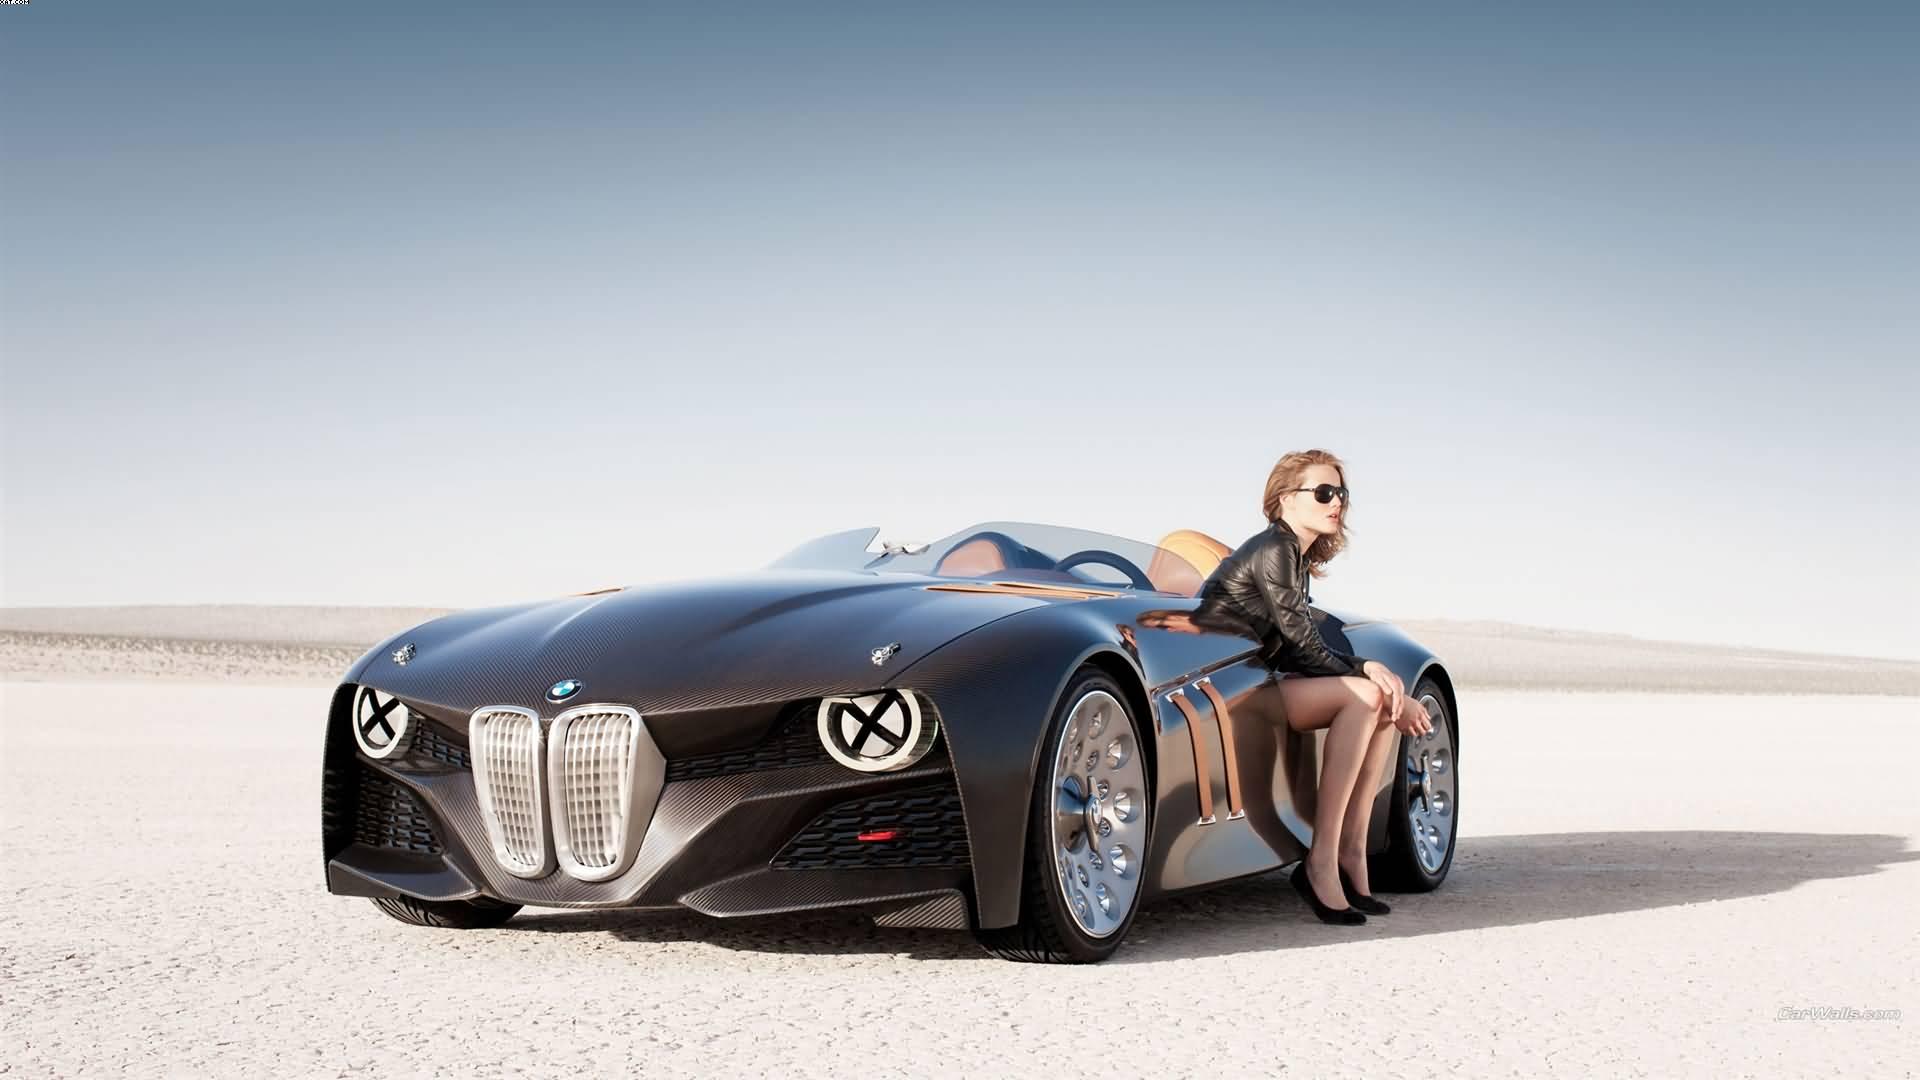 Girl Sitting In BMW 328 Car In Desert HD Wallpaper